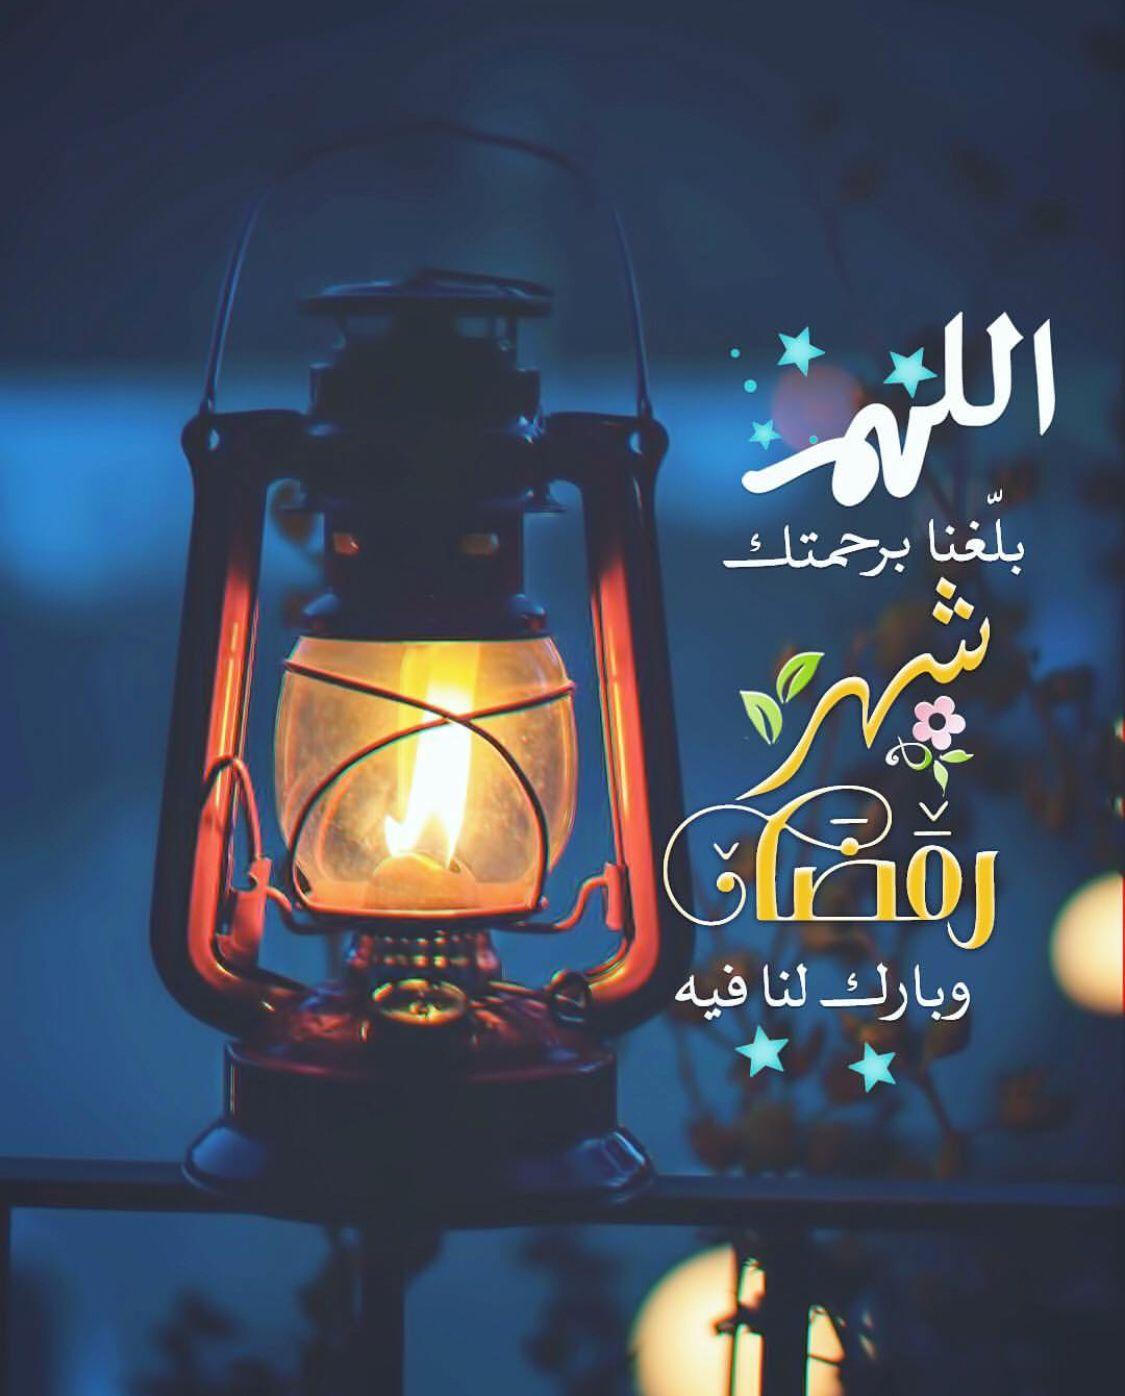 Pin By صورة و كلمة On رمضان كريم Ramadan Kareem Ramadan Ramadan Kareem Islamic Pictures